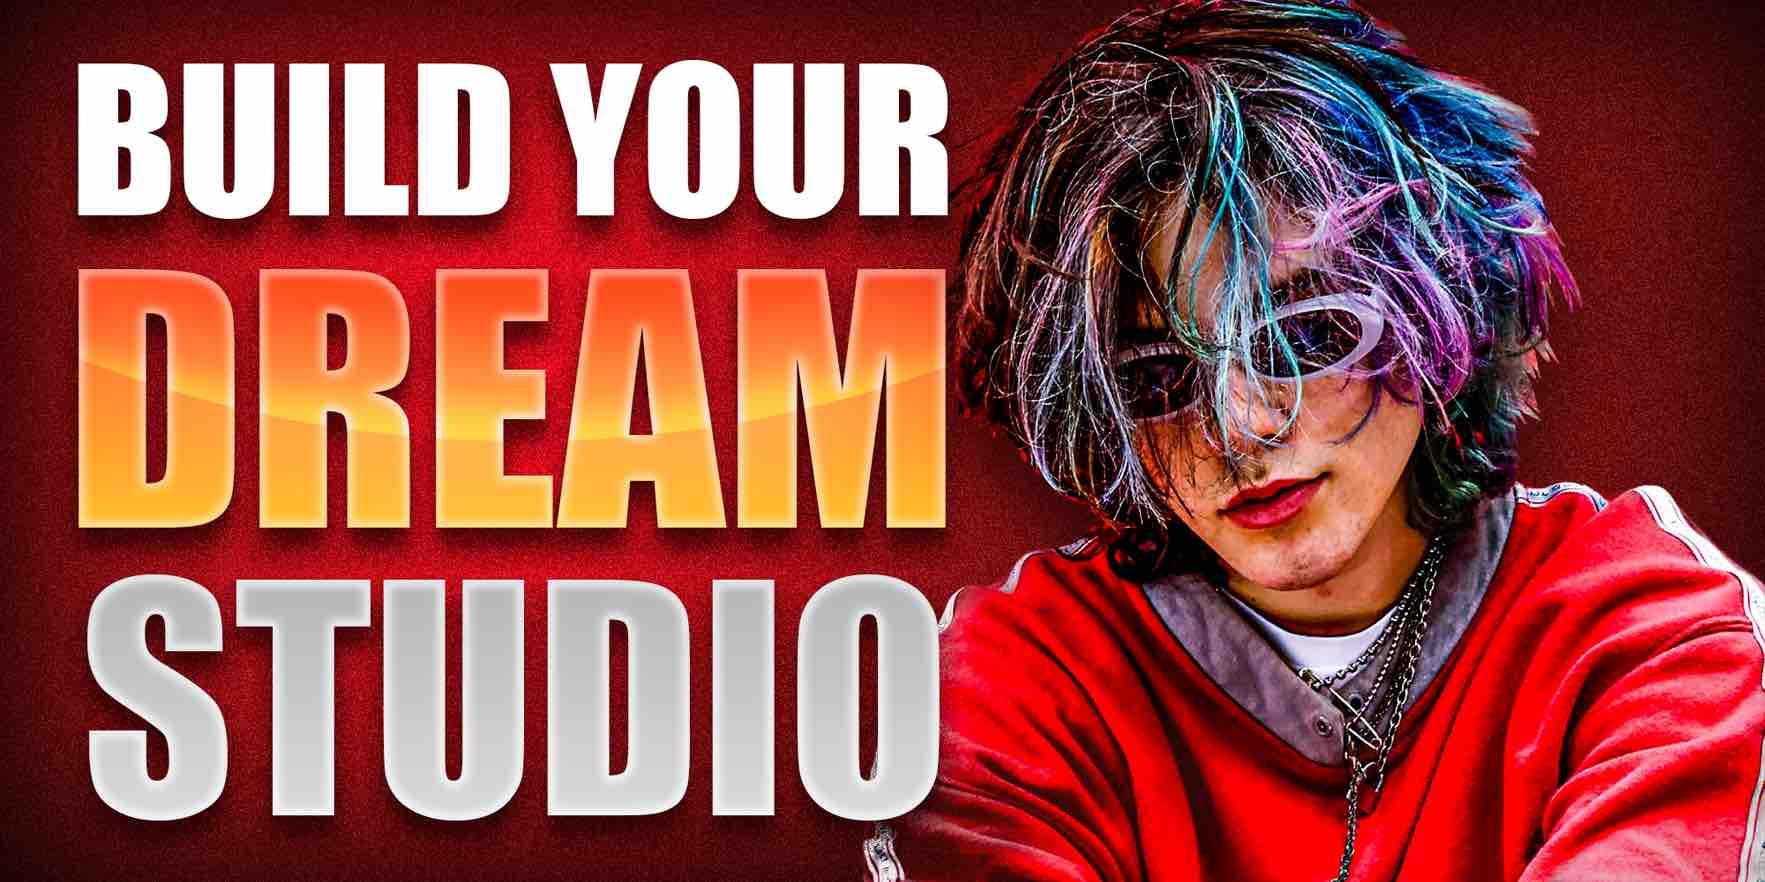 Build your music studio